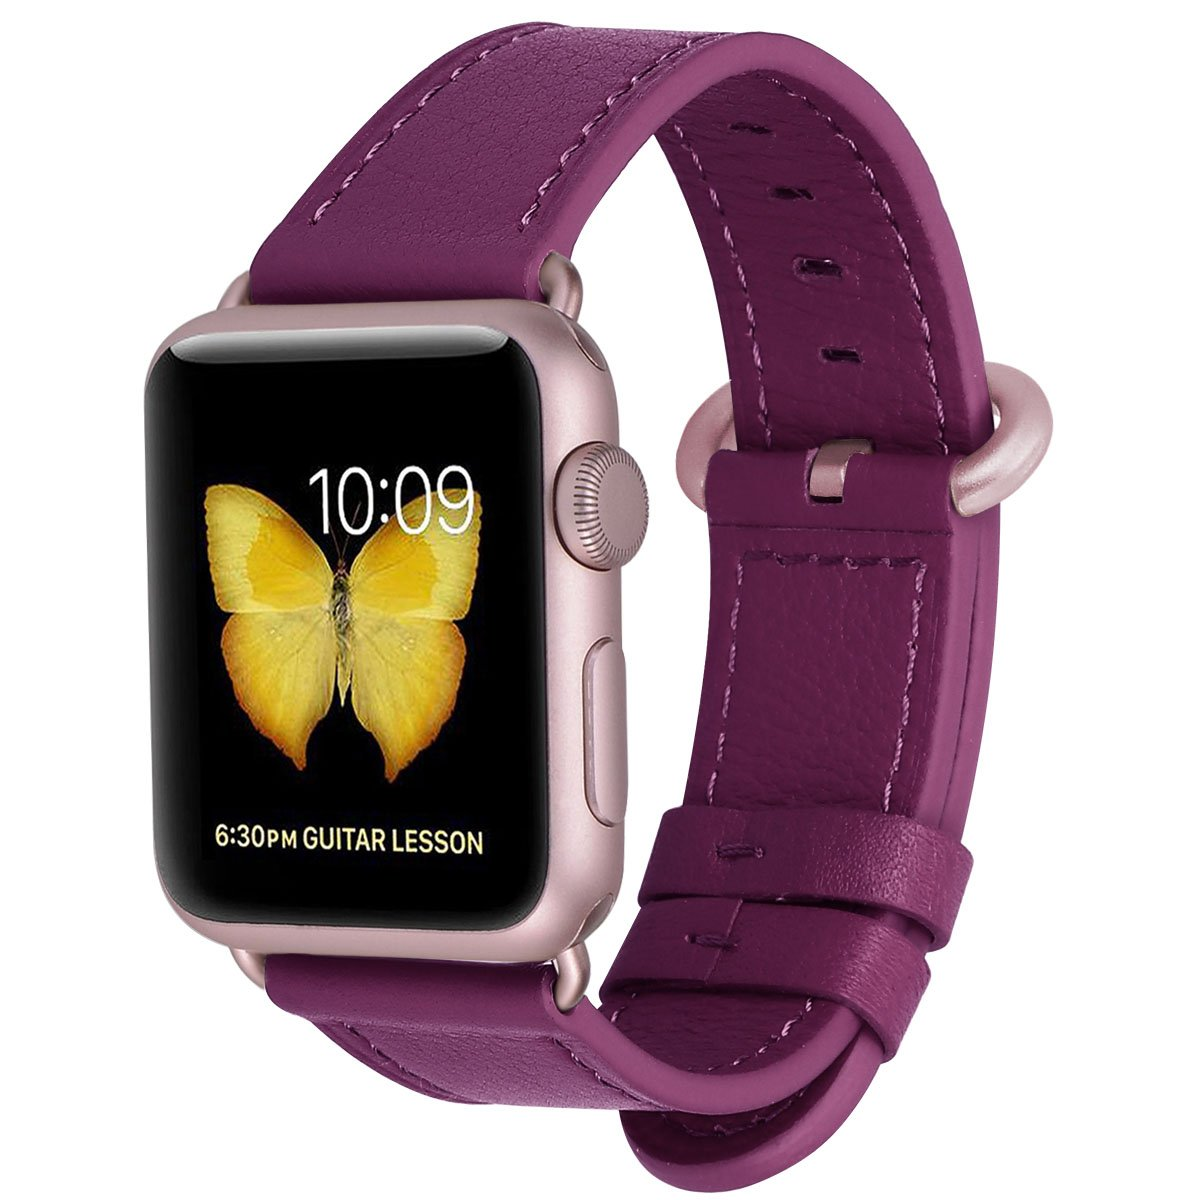 Malla Cuero para Apple Watch (38/40mm) PEAK ZHANG [7JLN437X]